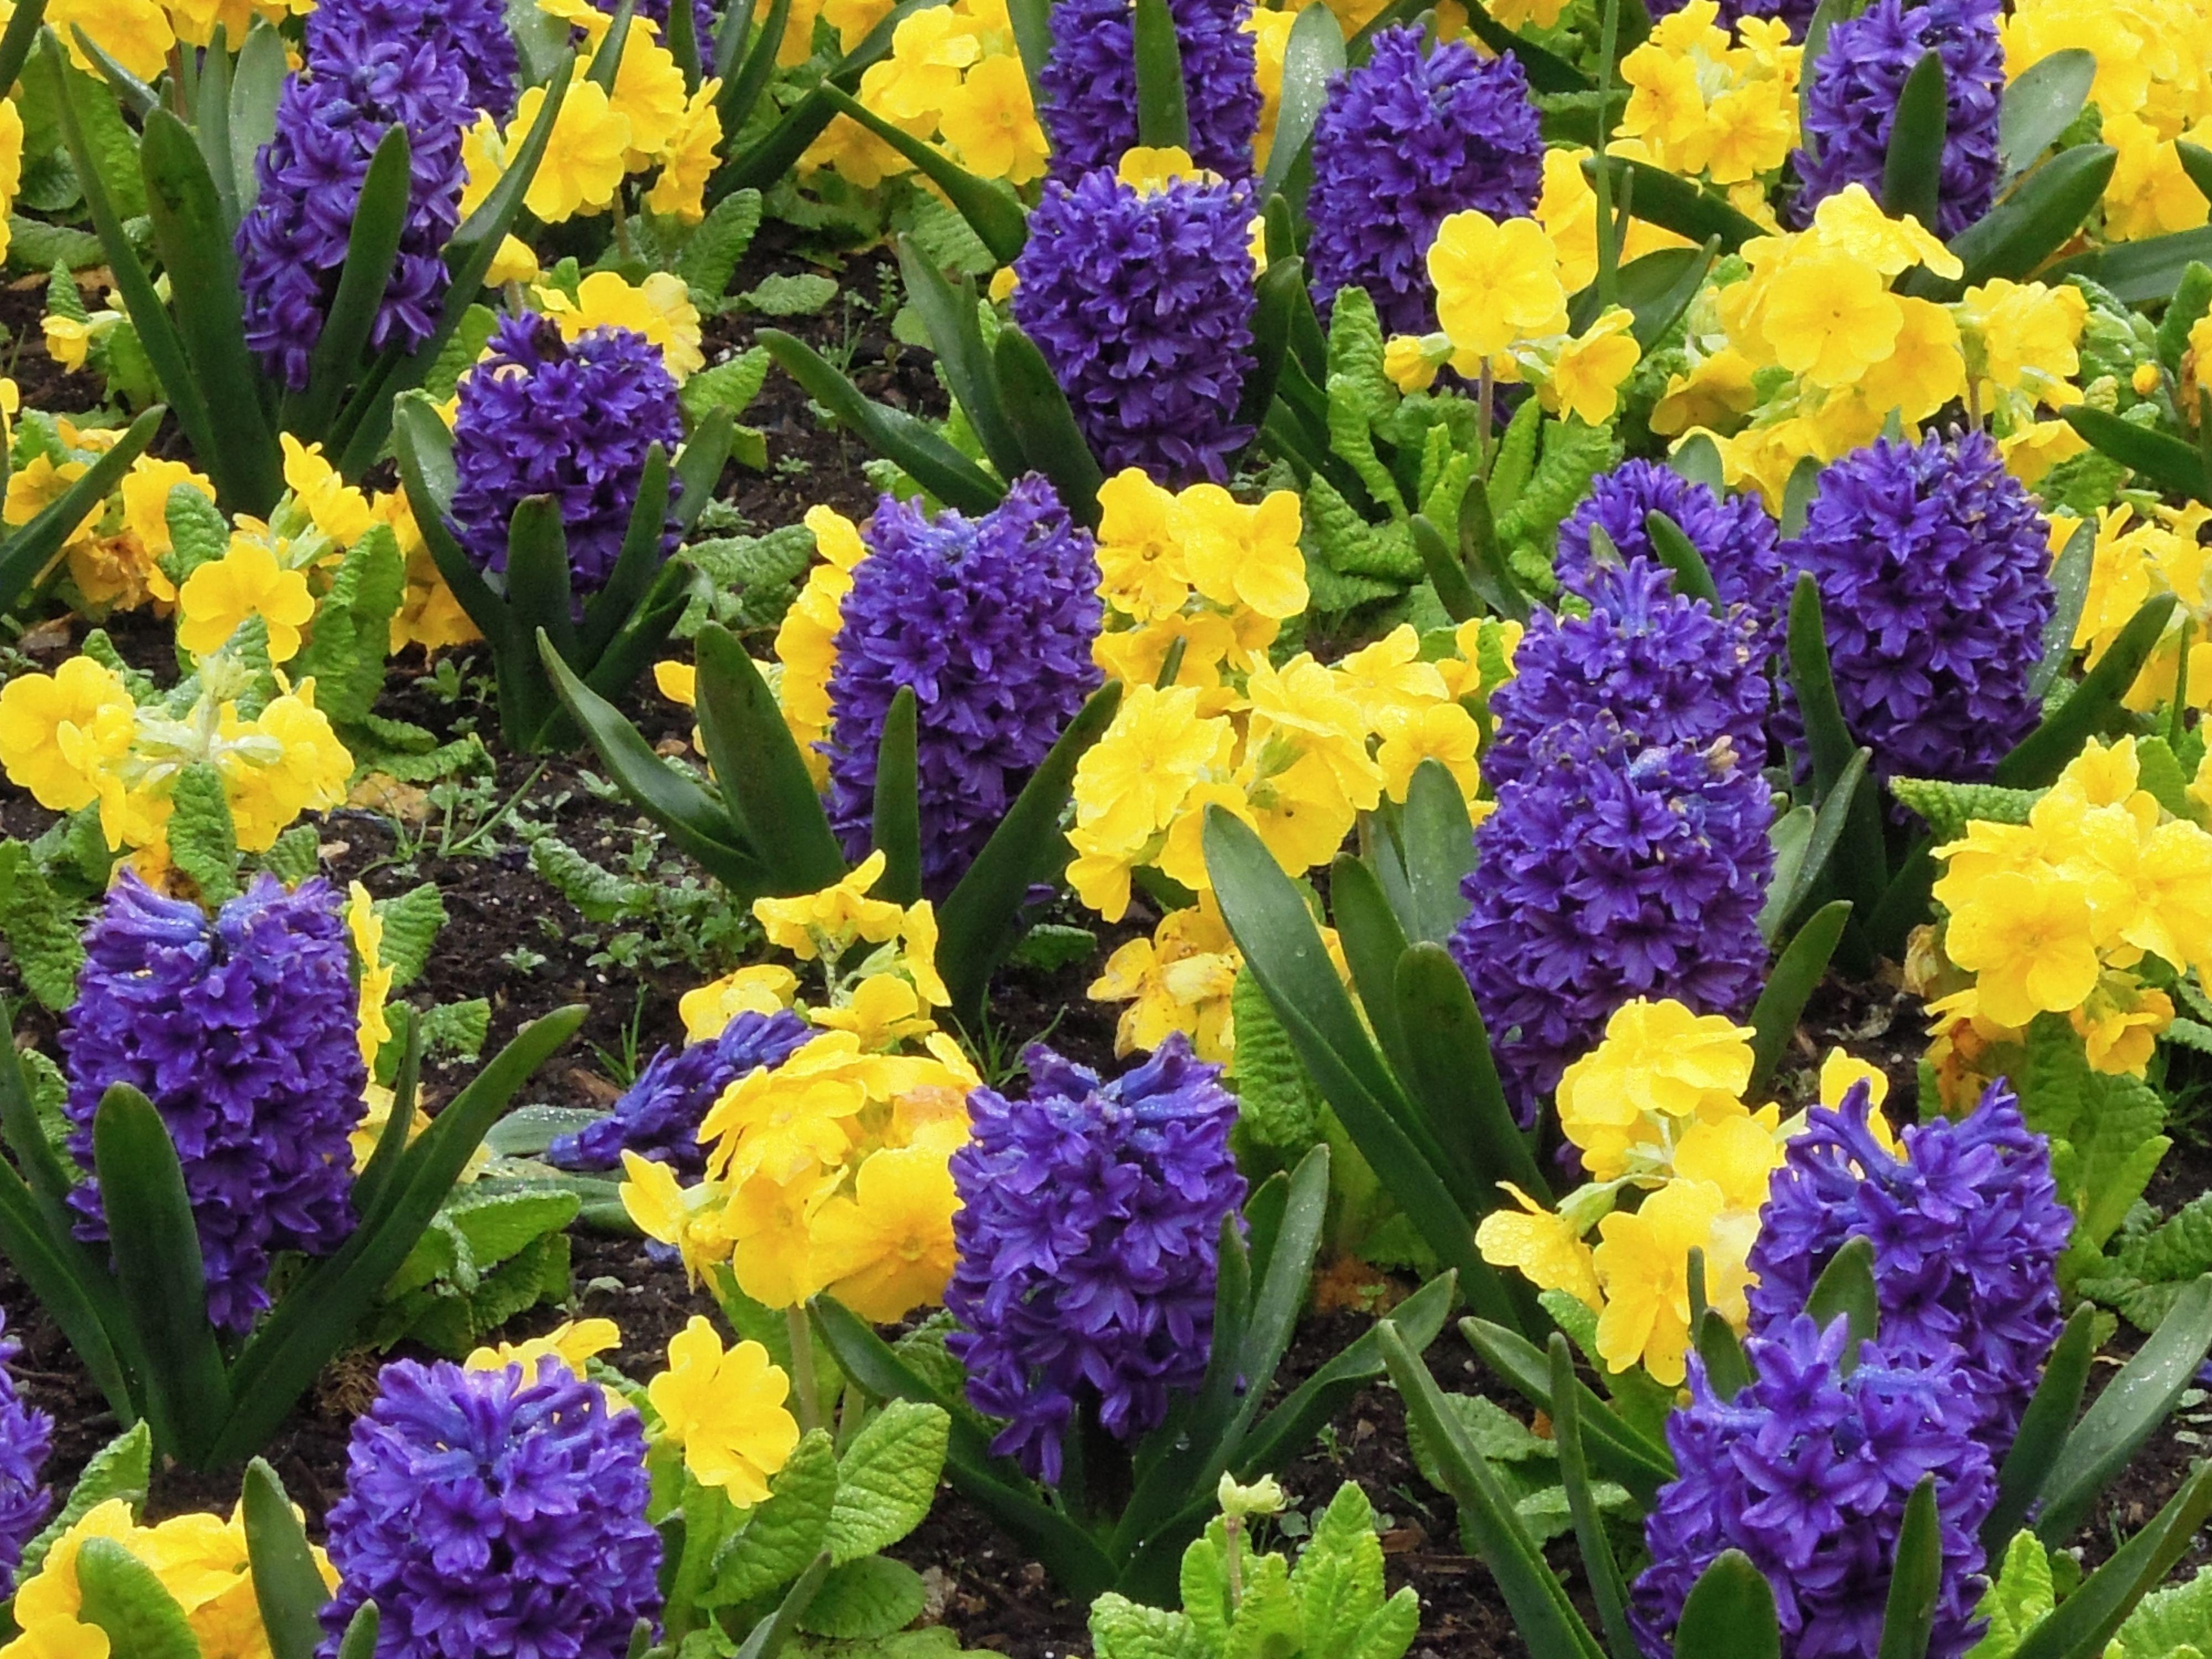 Yellow and Purple flowers full digital zoom.jpg 4,000 ...